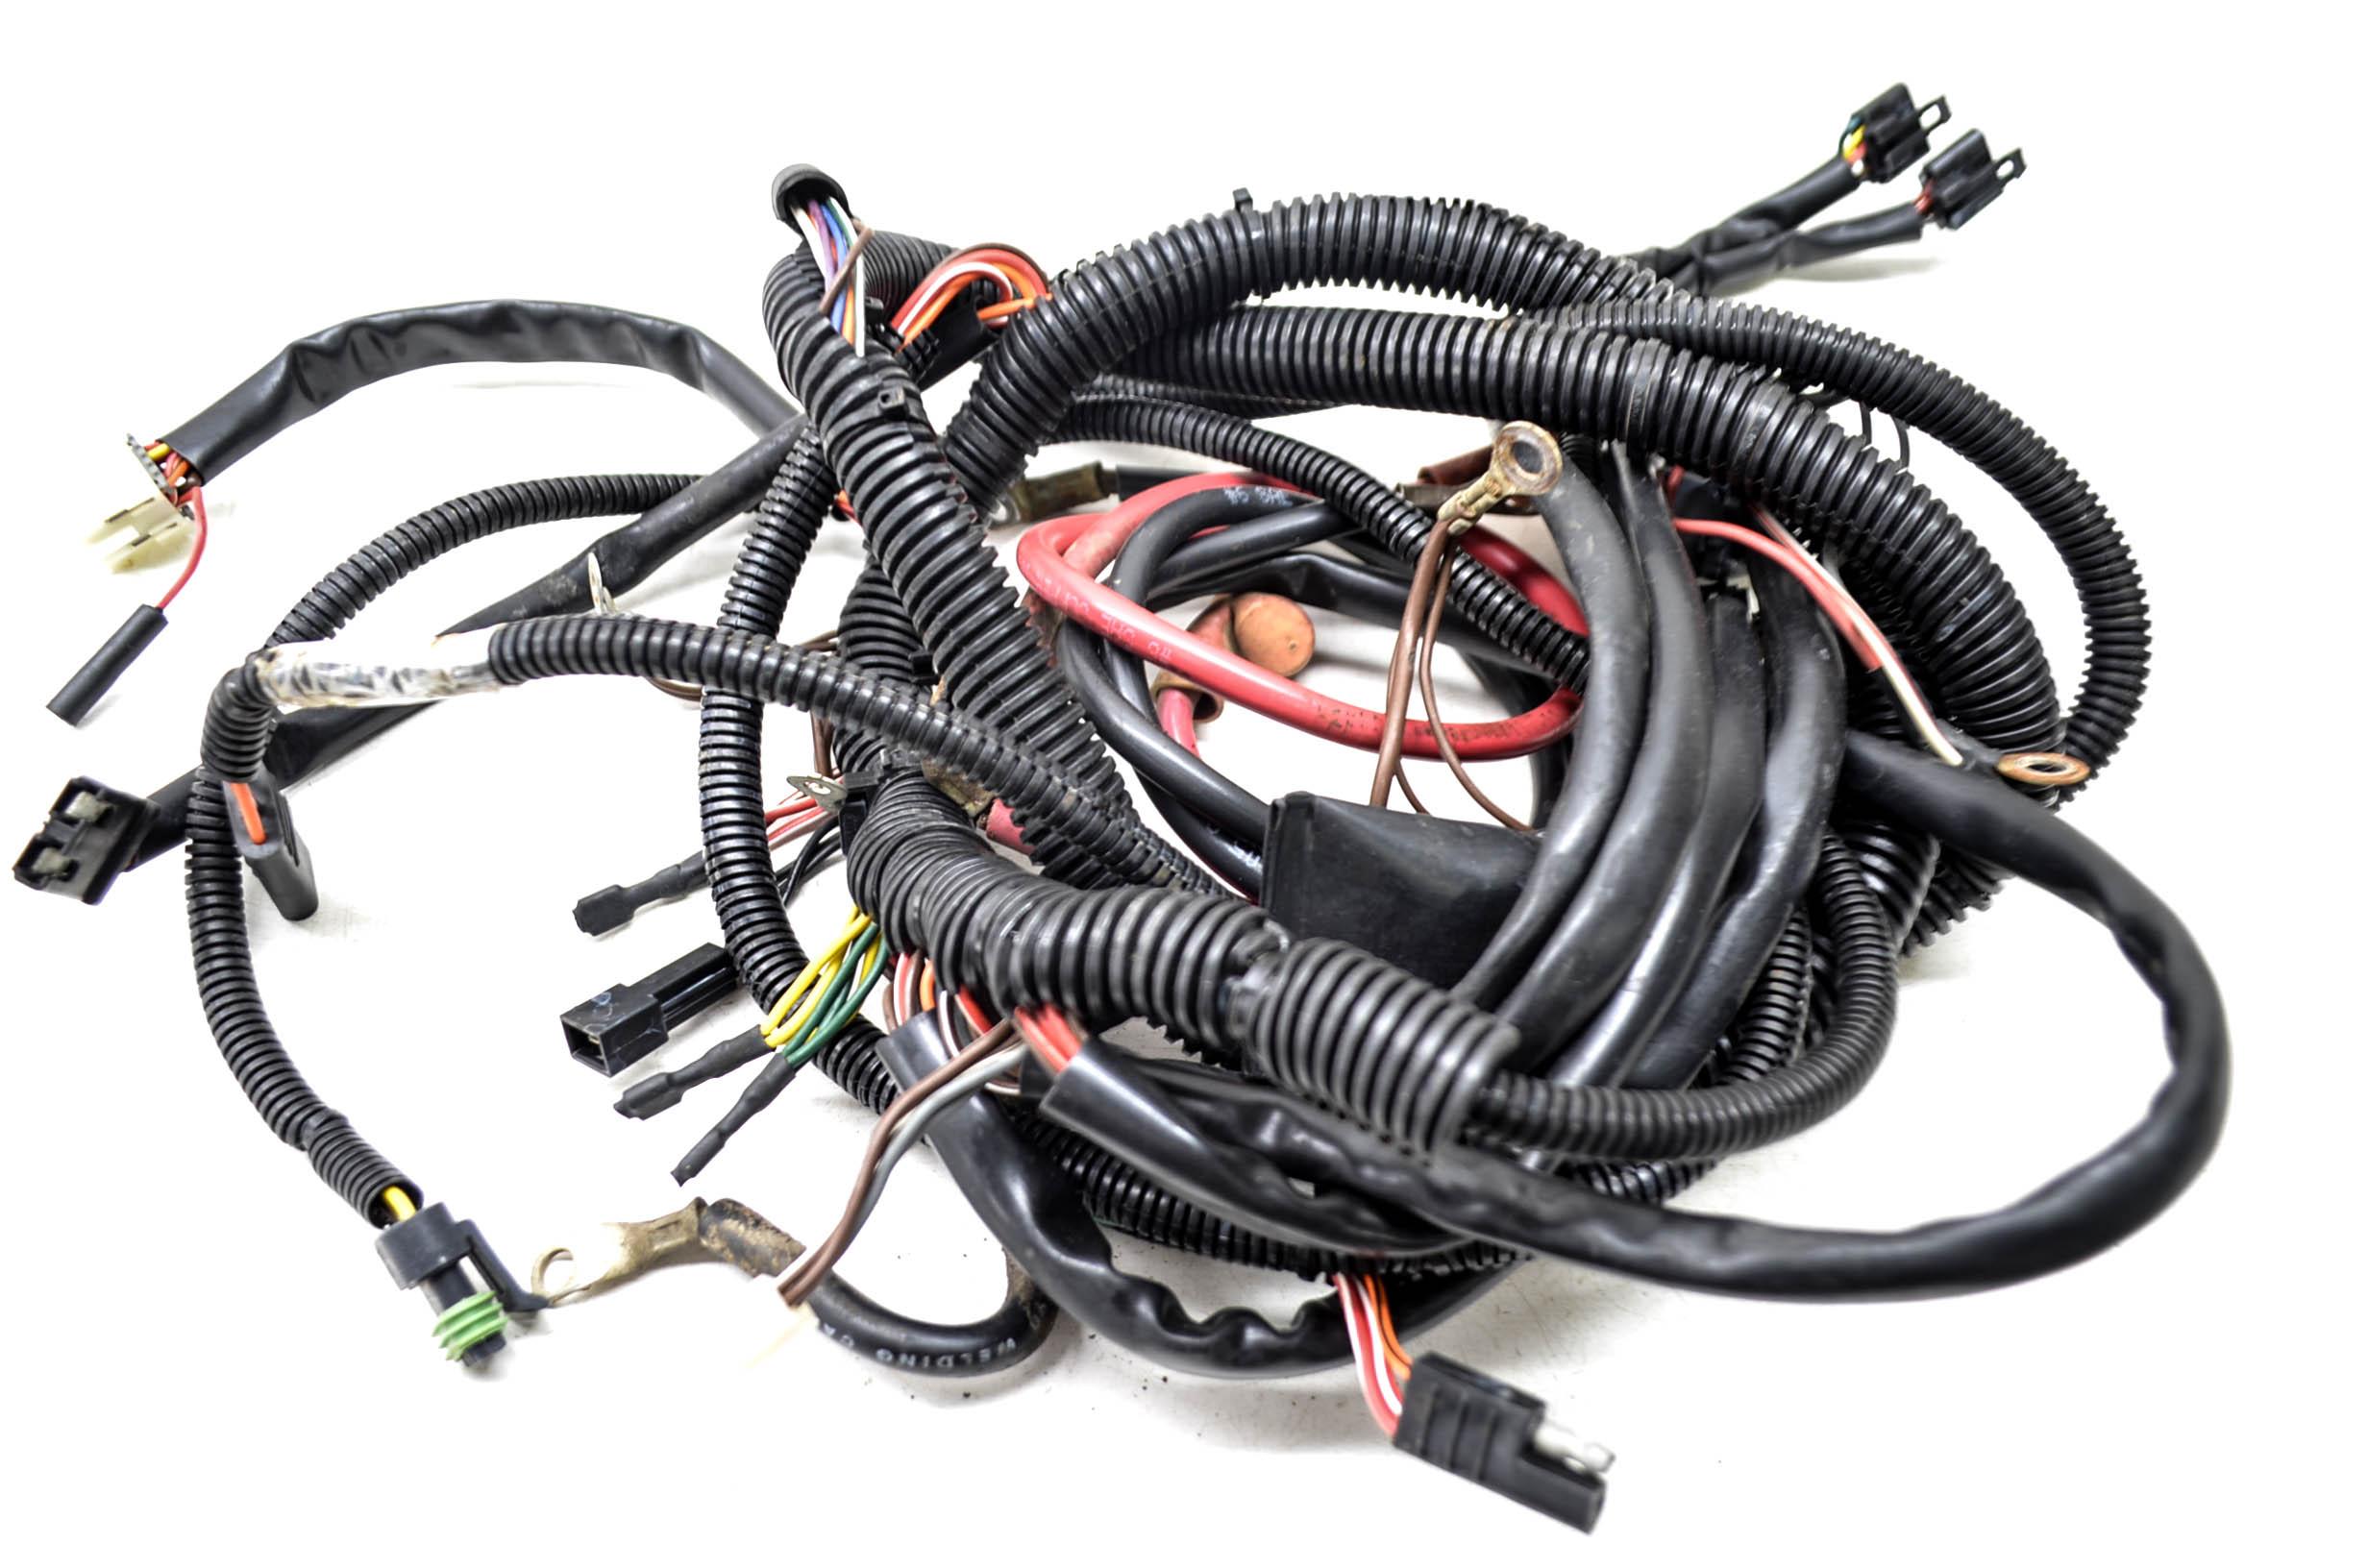 01 Polaris Magnum 325 4x4 HDS Wire Harness Electrical Wiring | eBay